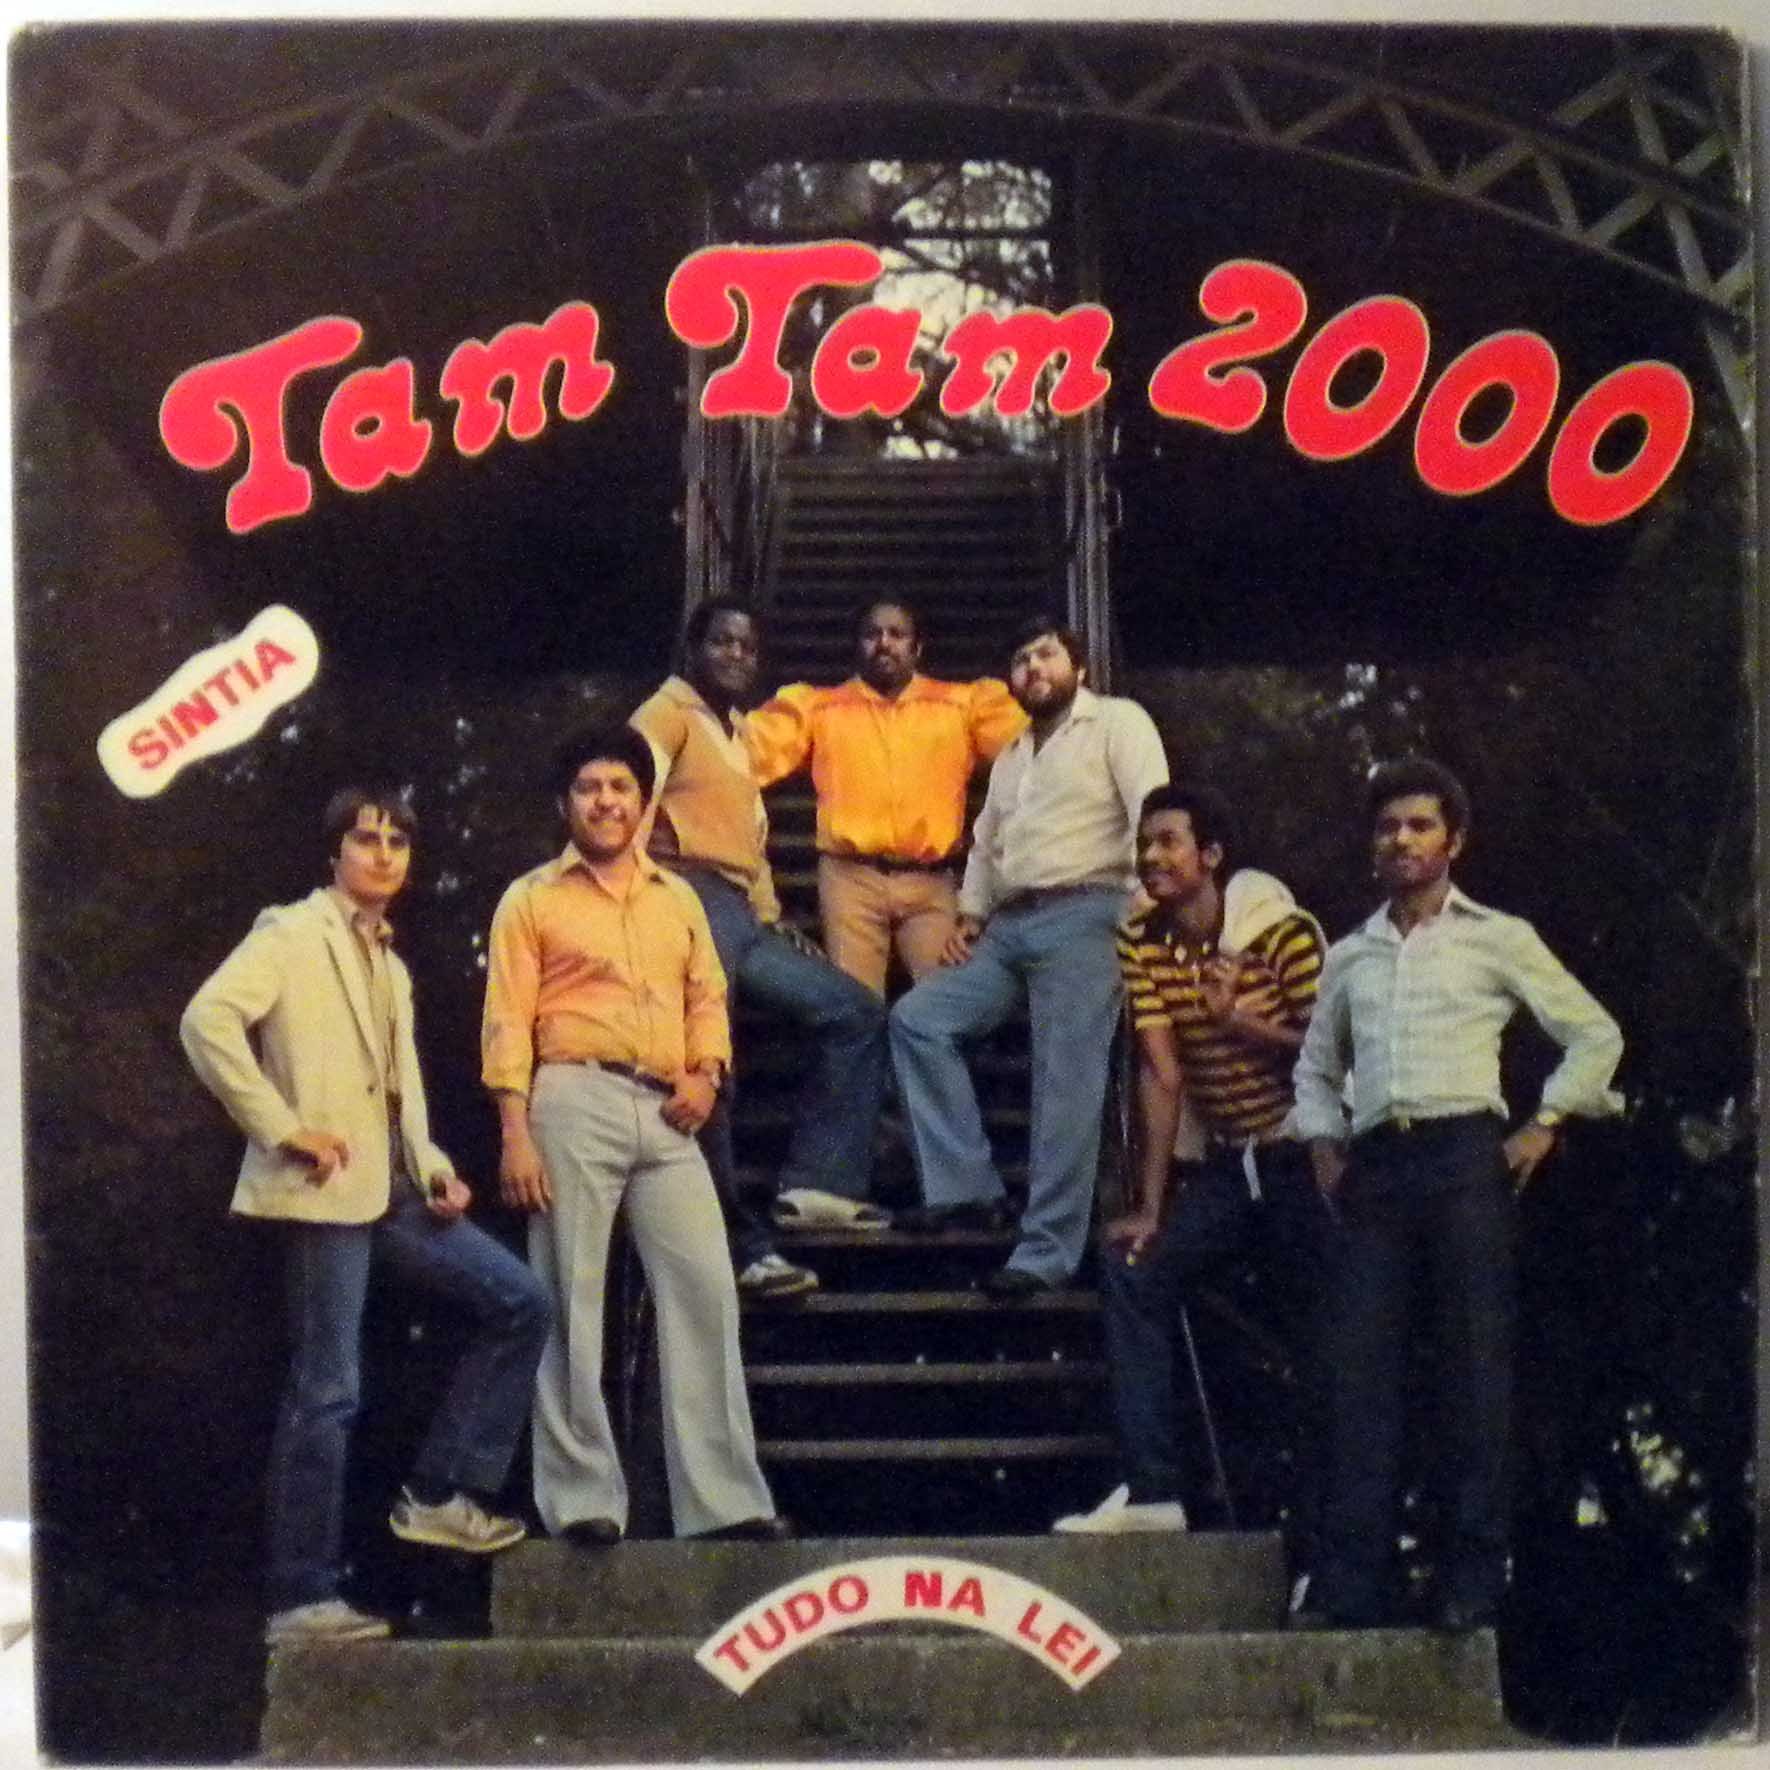 TAM TAM 2000 - Tudo na Lei - LP